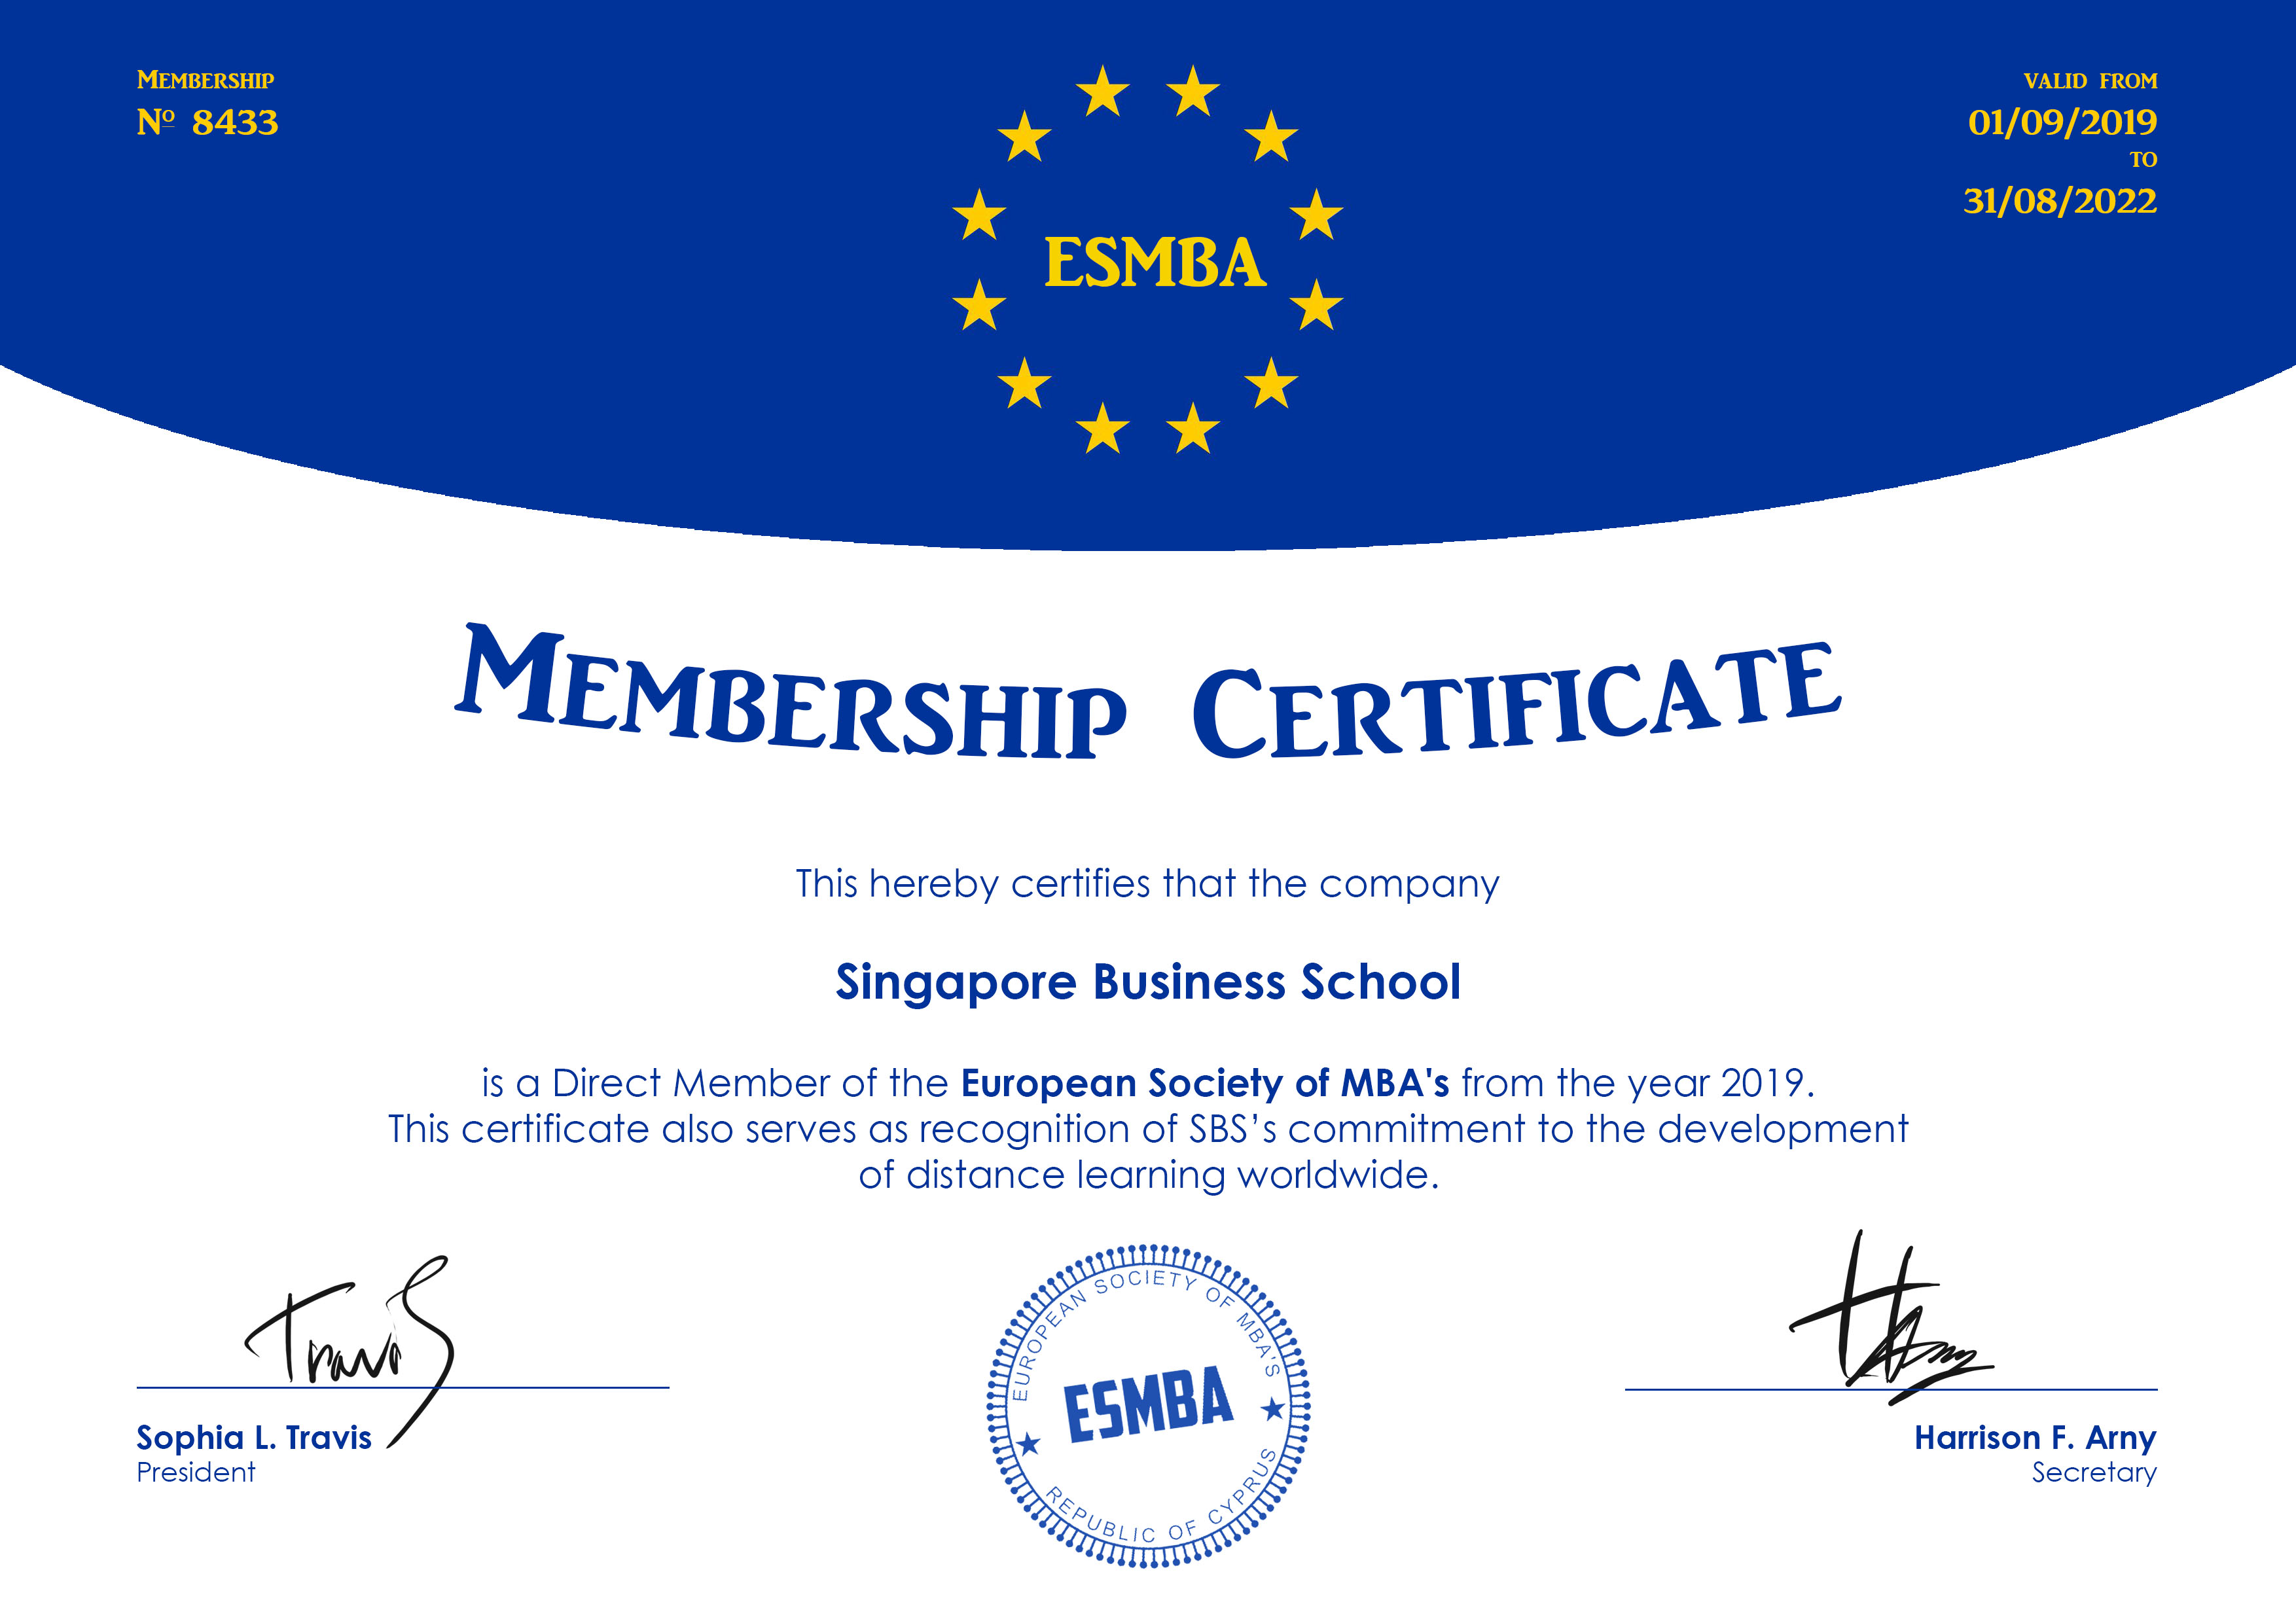 European Society of MBAs